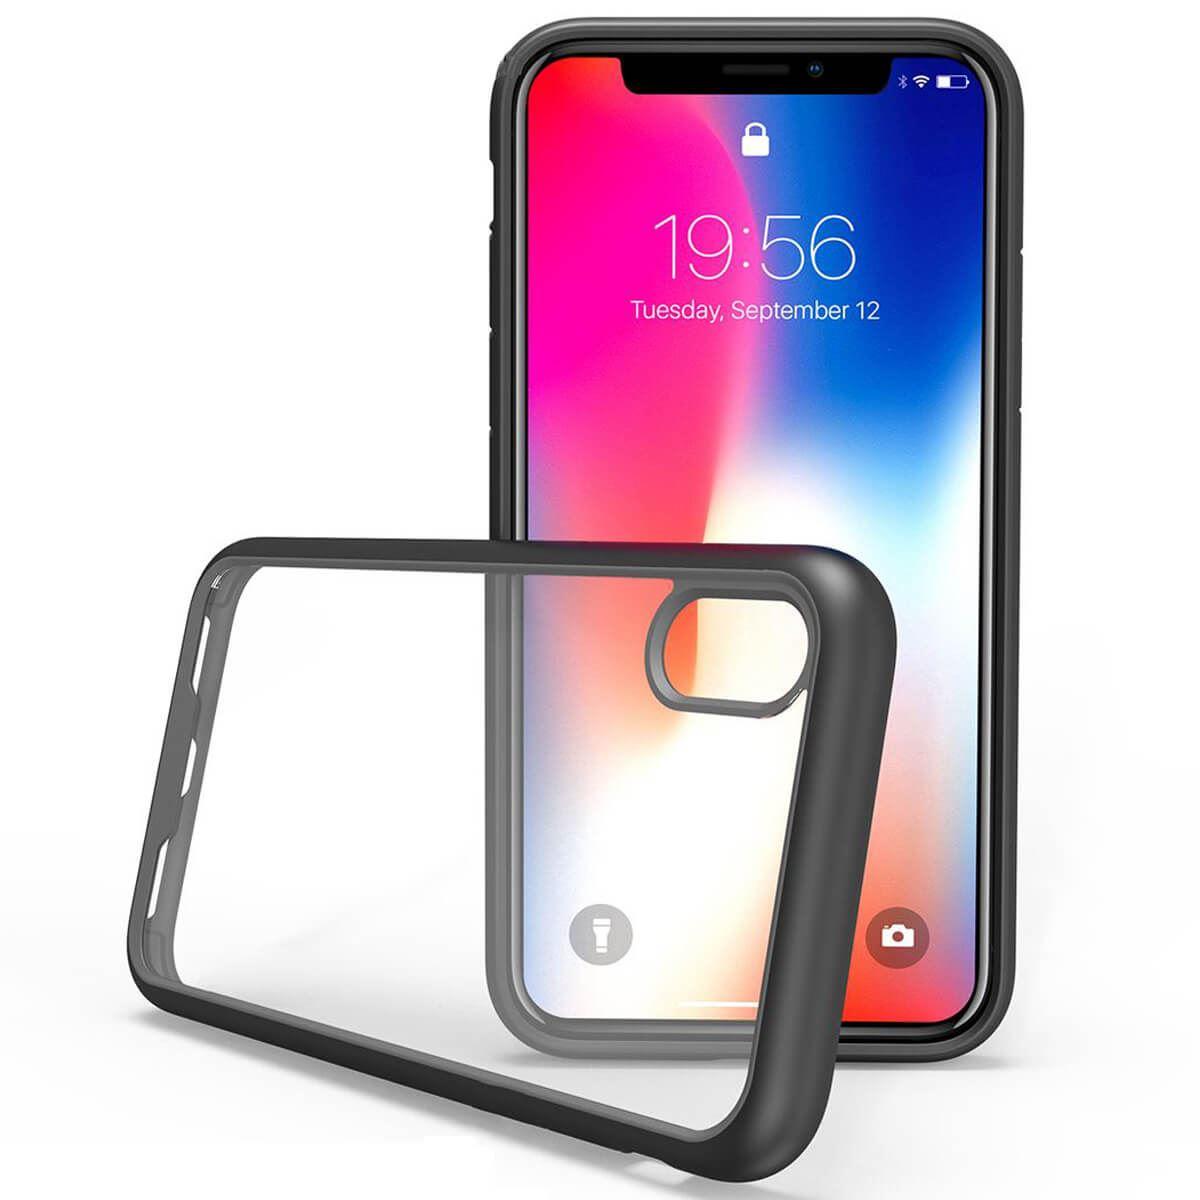 Shockproof-Bumper-Case-For-iPhone-X-XS-XR-6-Plus-7-Plus-6-Plus-Hard-Armor thumbnail 3